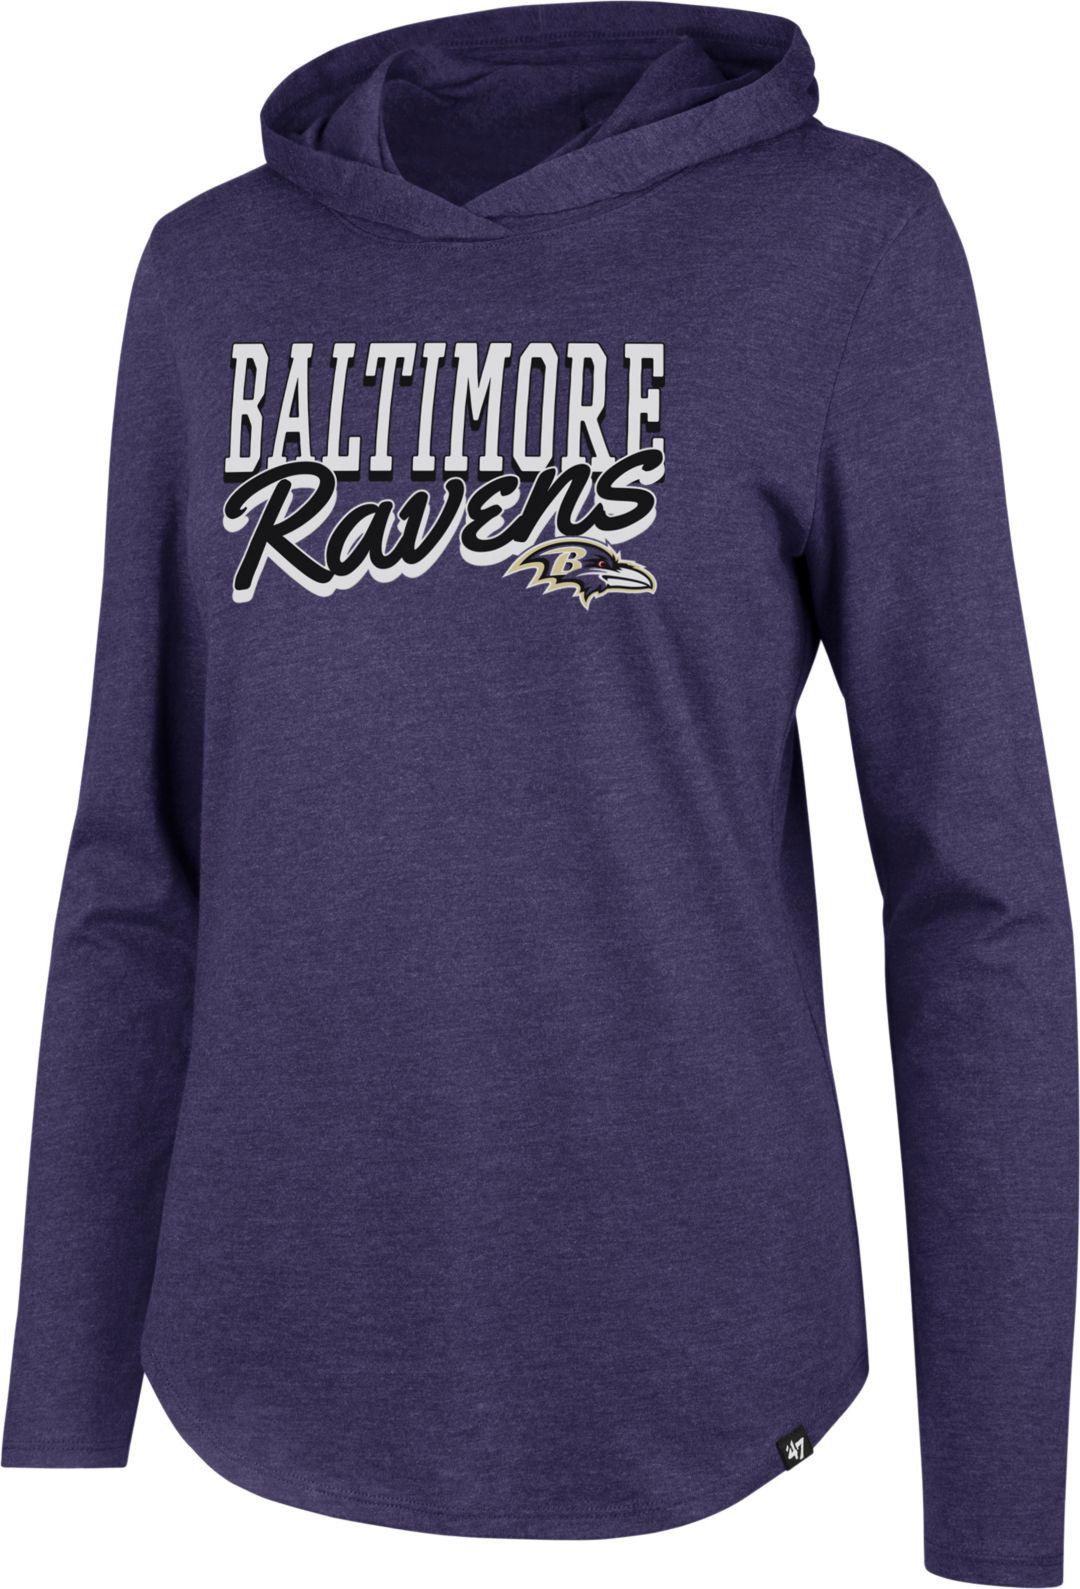 8e85d06b '47 Women's Baltimore Ravens Club Purple Hooded Long Sleeve Shirt